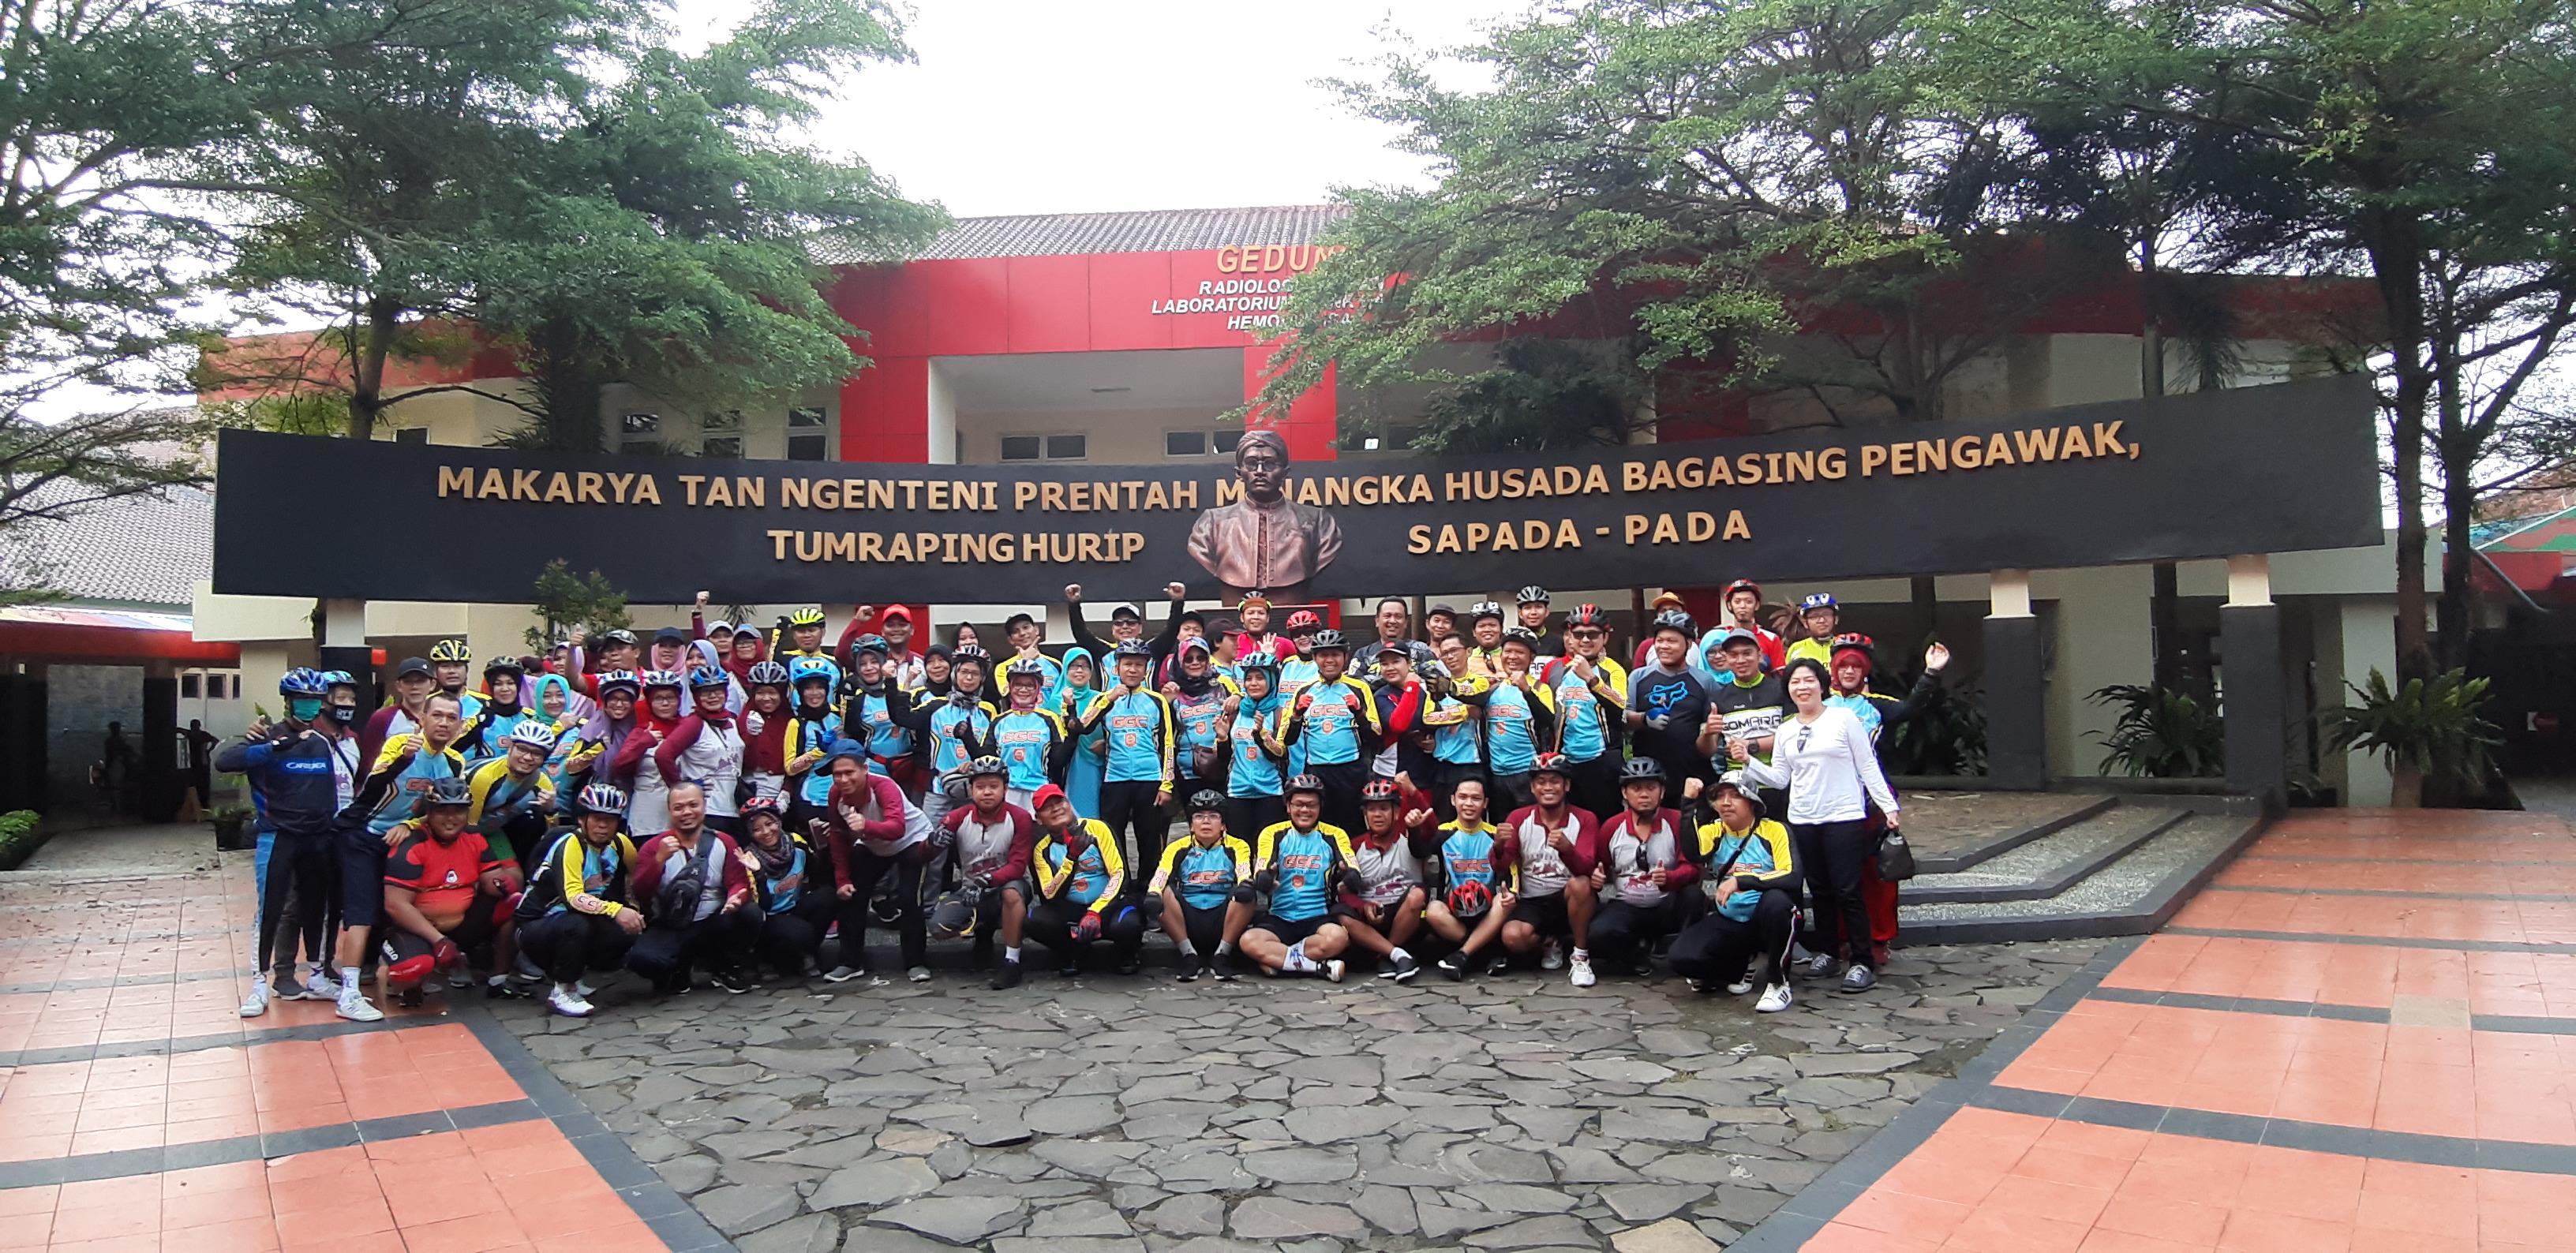 Goeteng Gowes Club RSUD dr. R. Goeteng Taroenadibrata Purbalingga